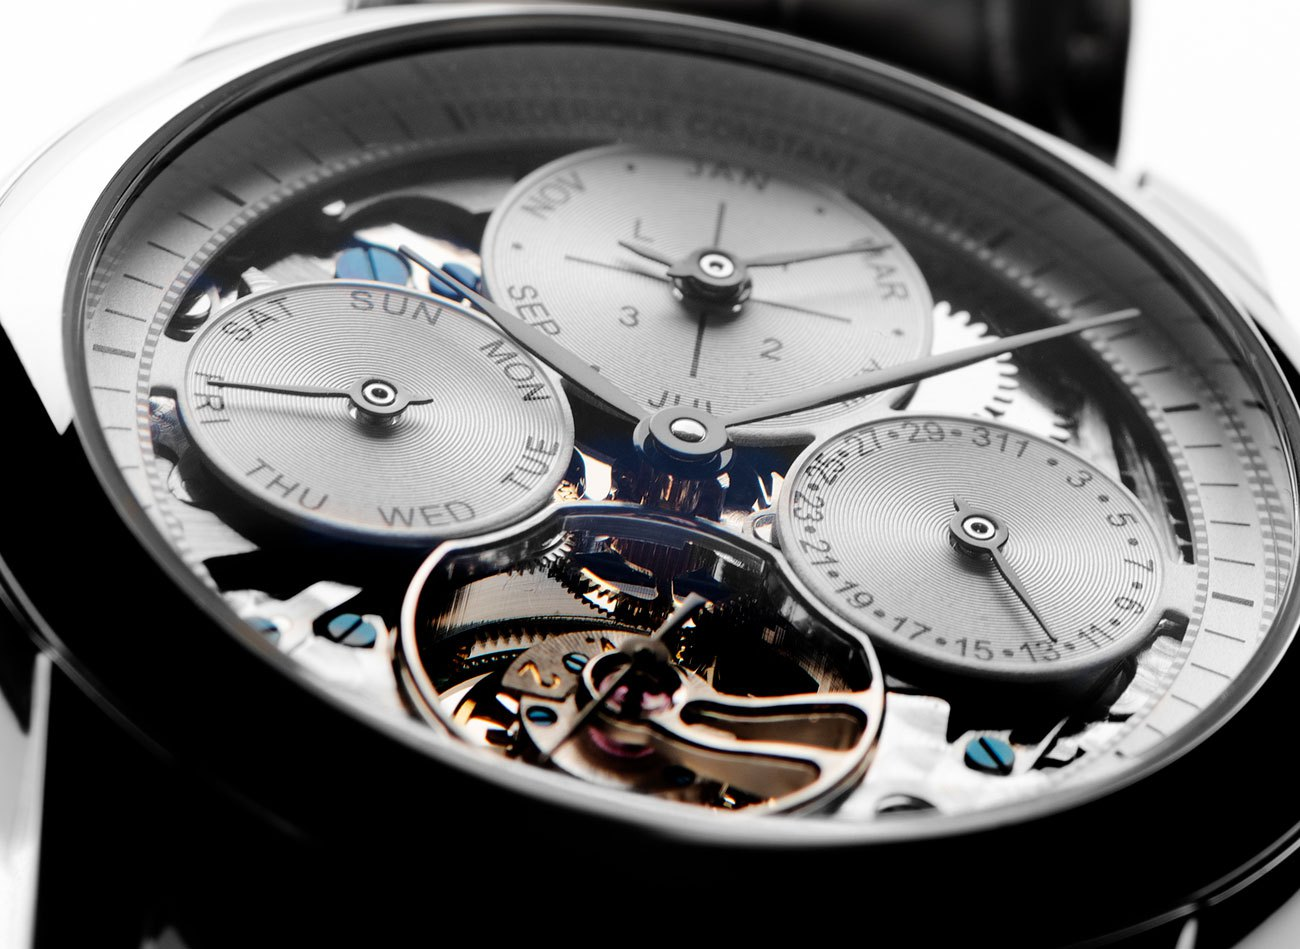 frederique-constant-perpetual-calendar-tourbillon-manufacture-10.jpg